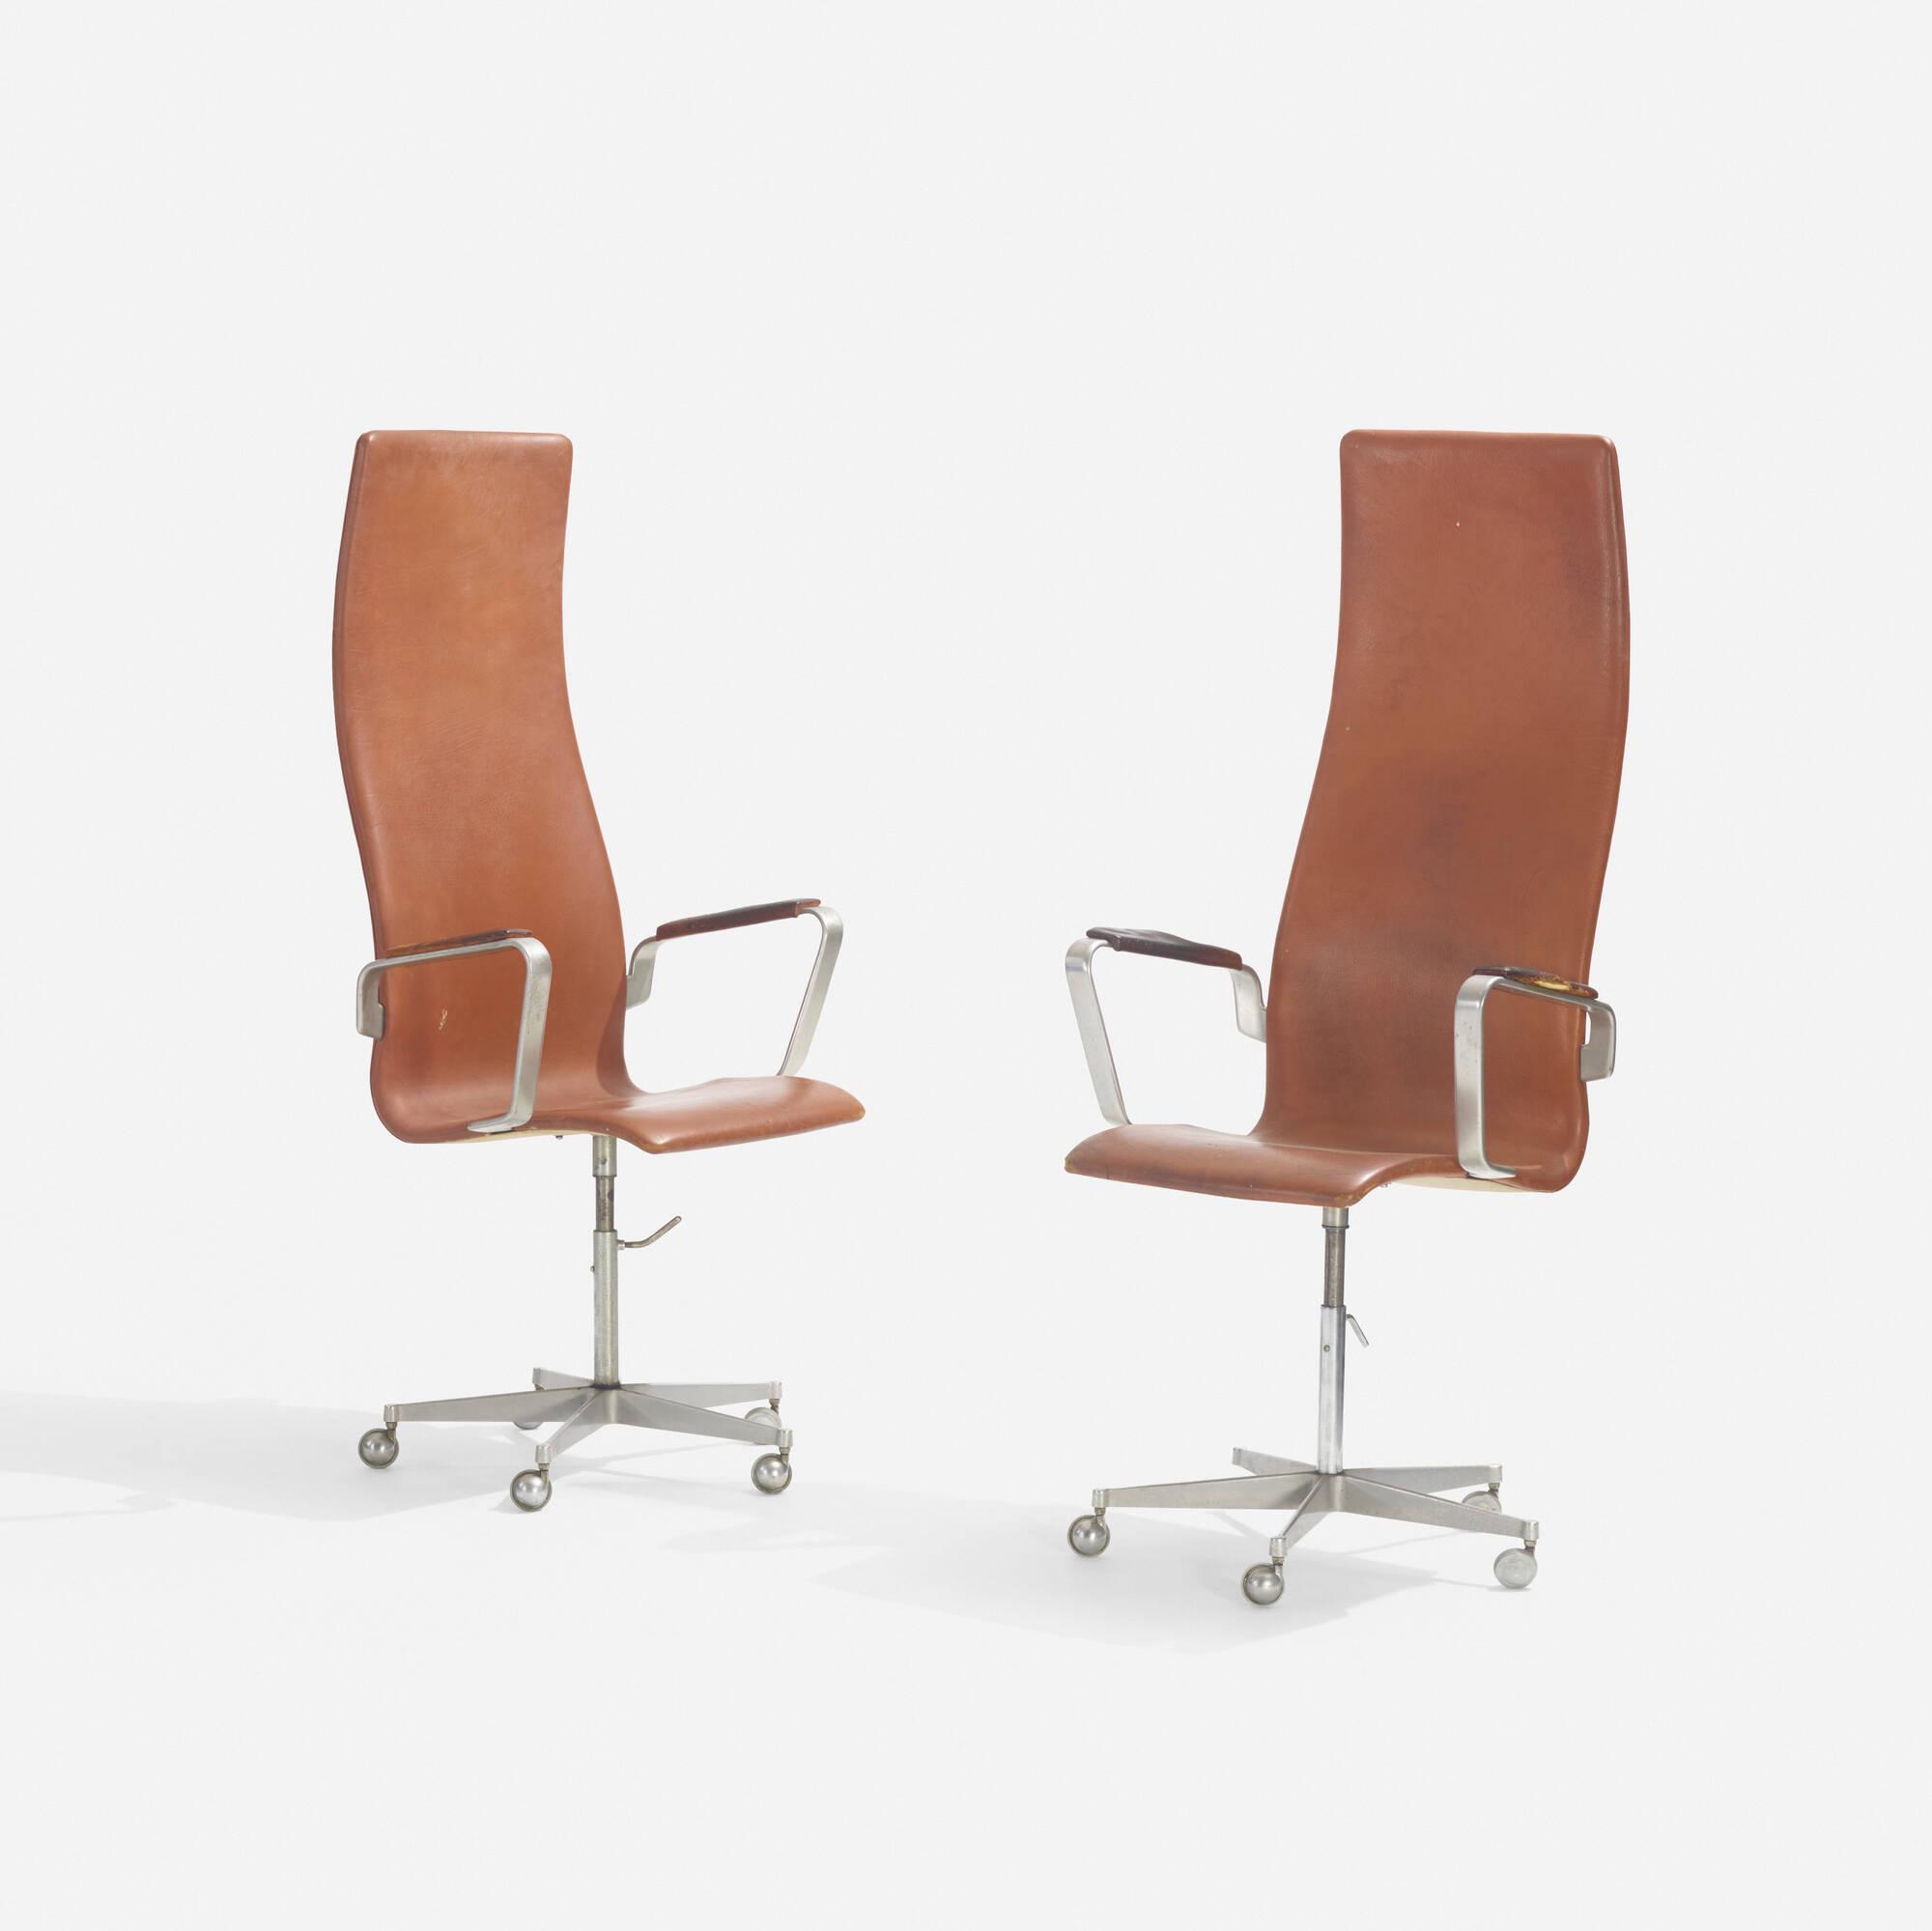 223: Arne Jacobsen / Oxford armchairs, pair (2 of 2)